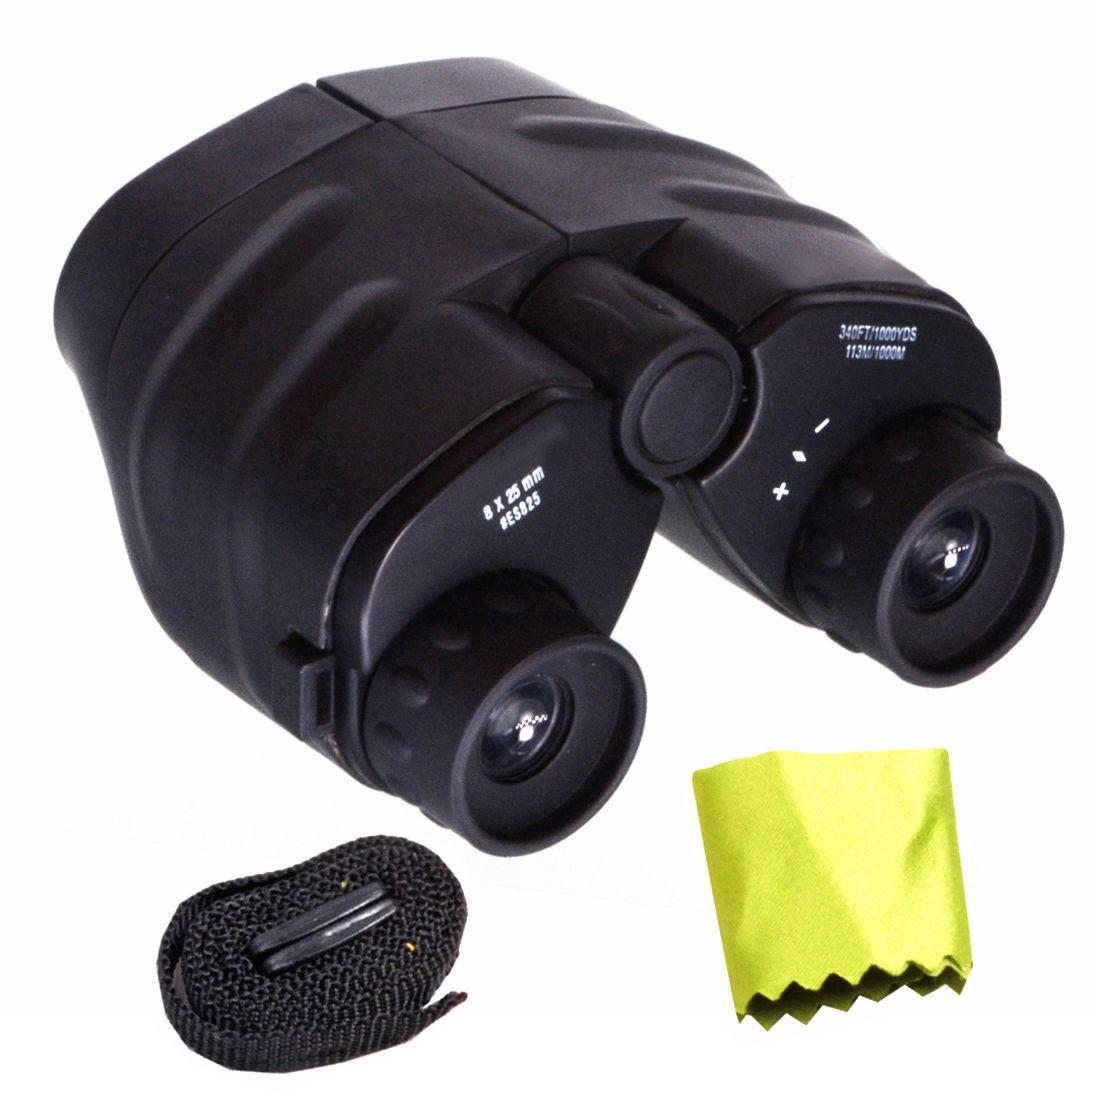 Jm Waterproof 8x25 Zoom 25x Prism Binocular Telescope Monocular With Pouch Binocular